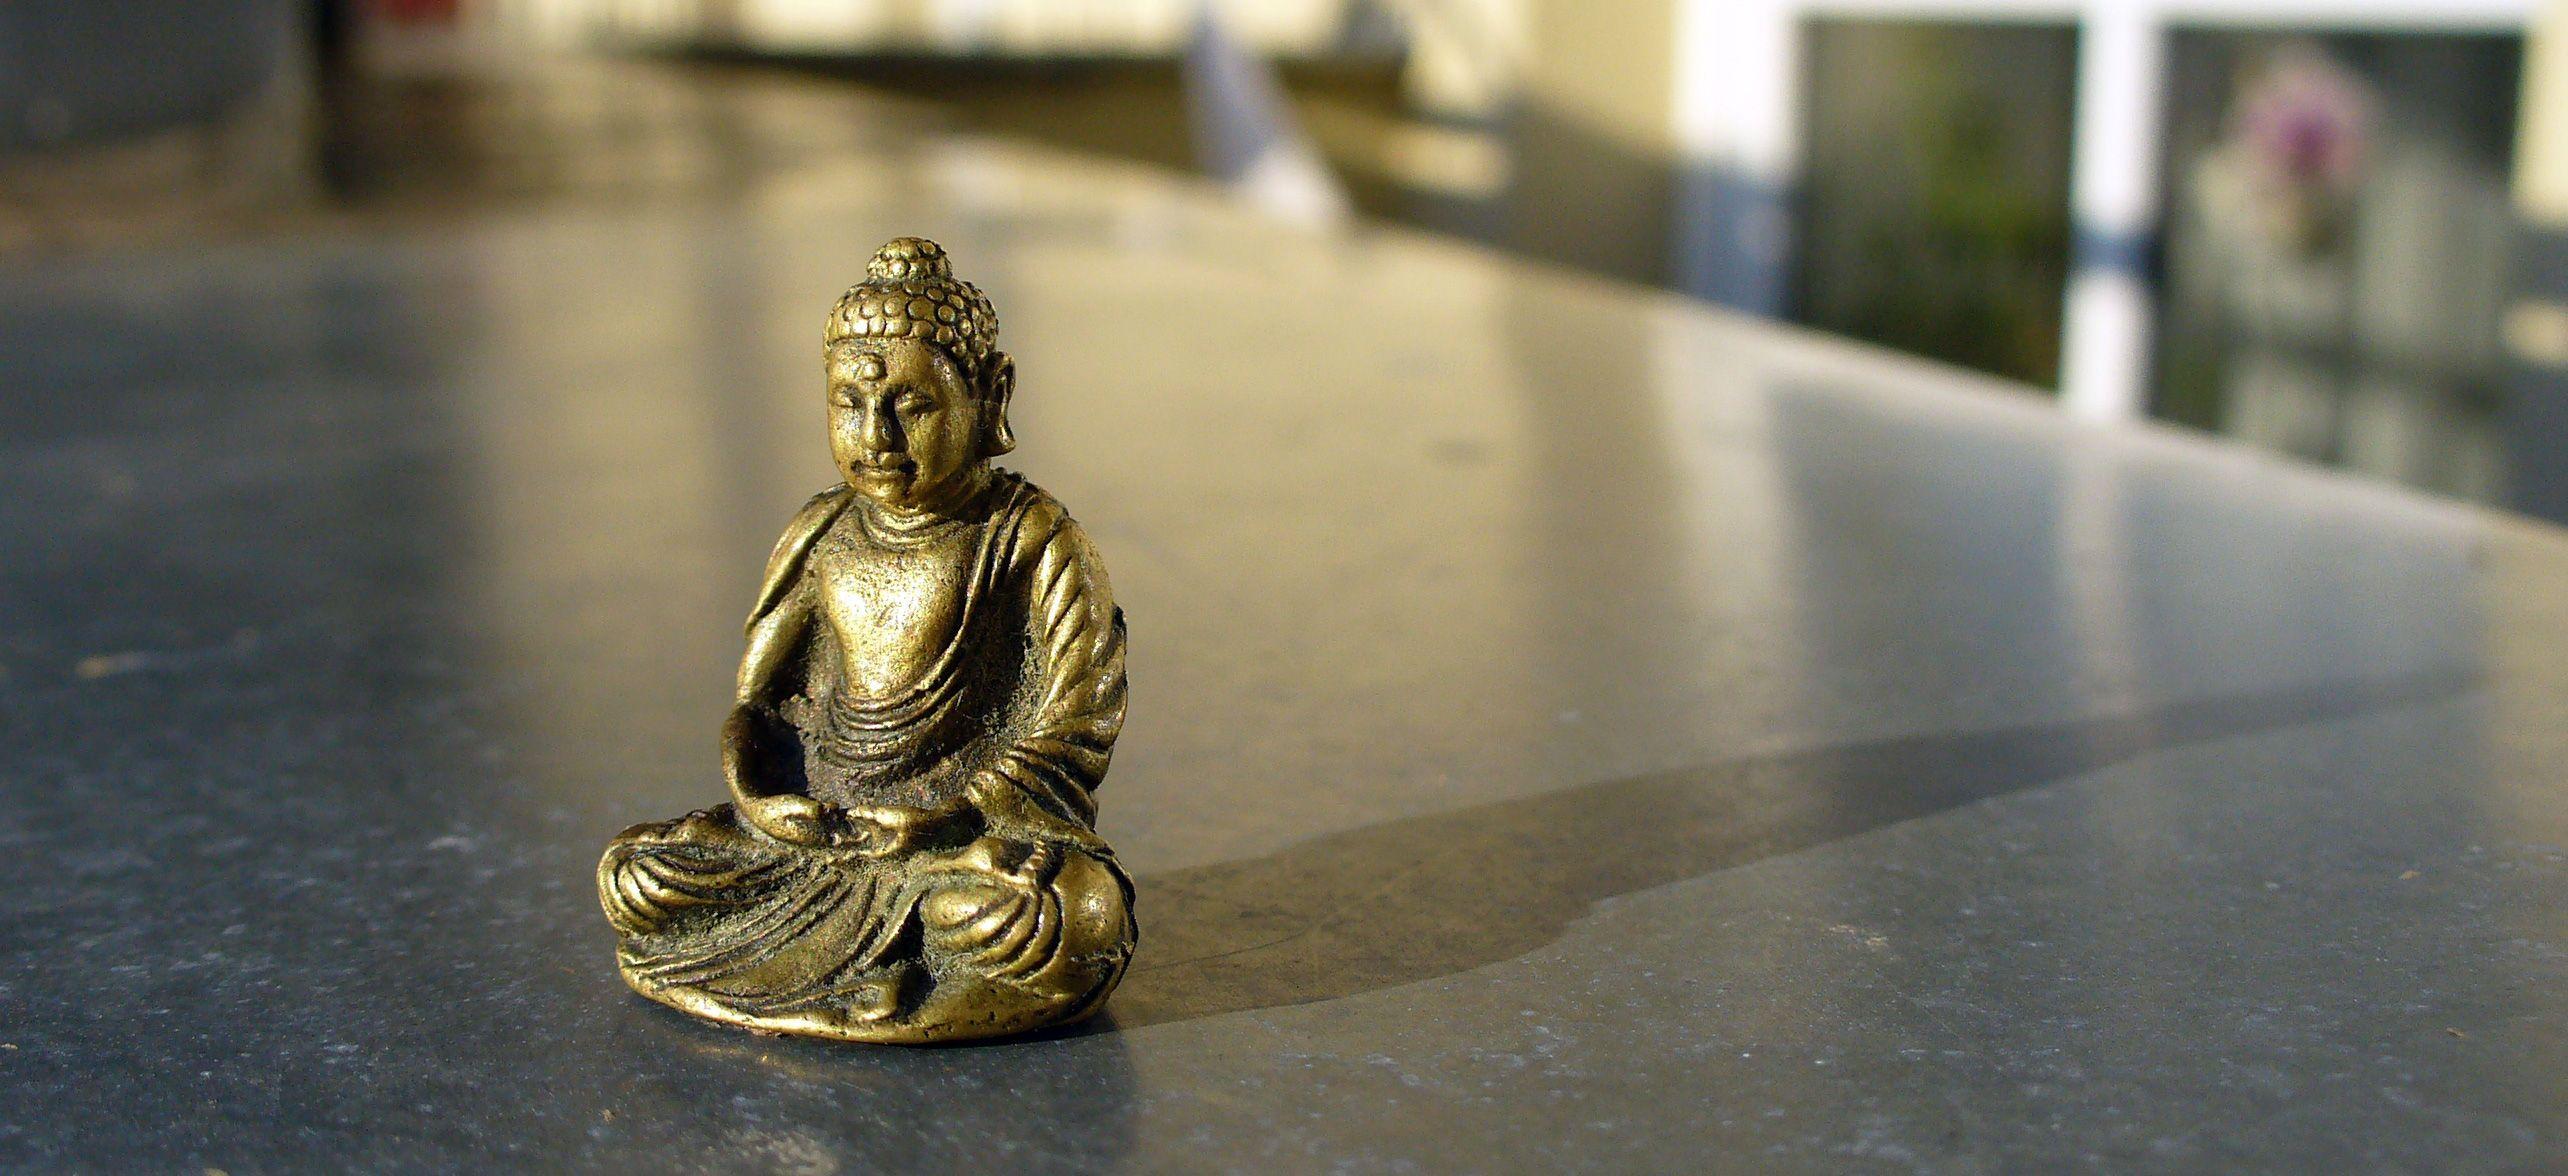 Buddha Wallpaper Images A16